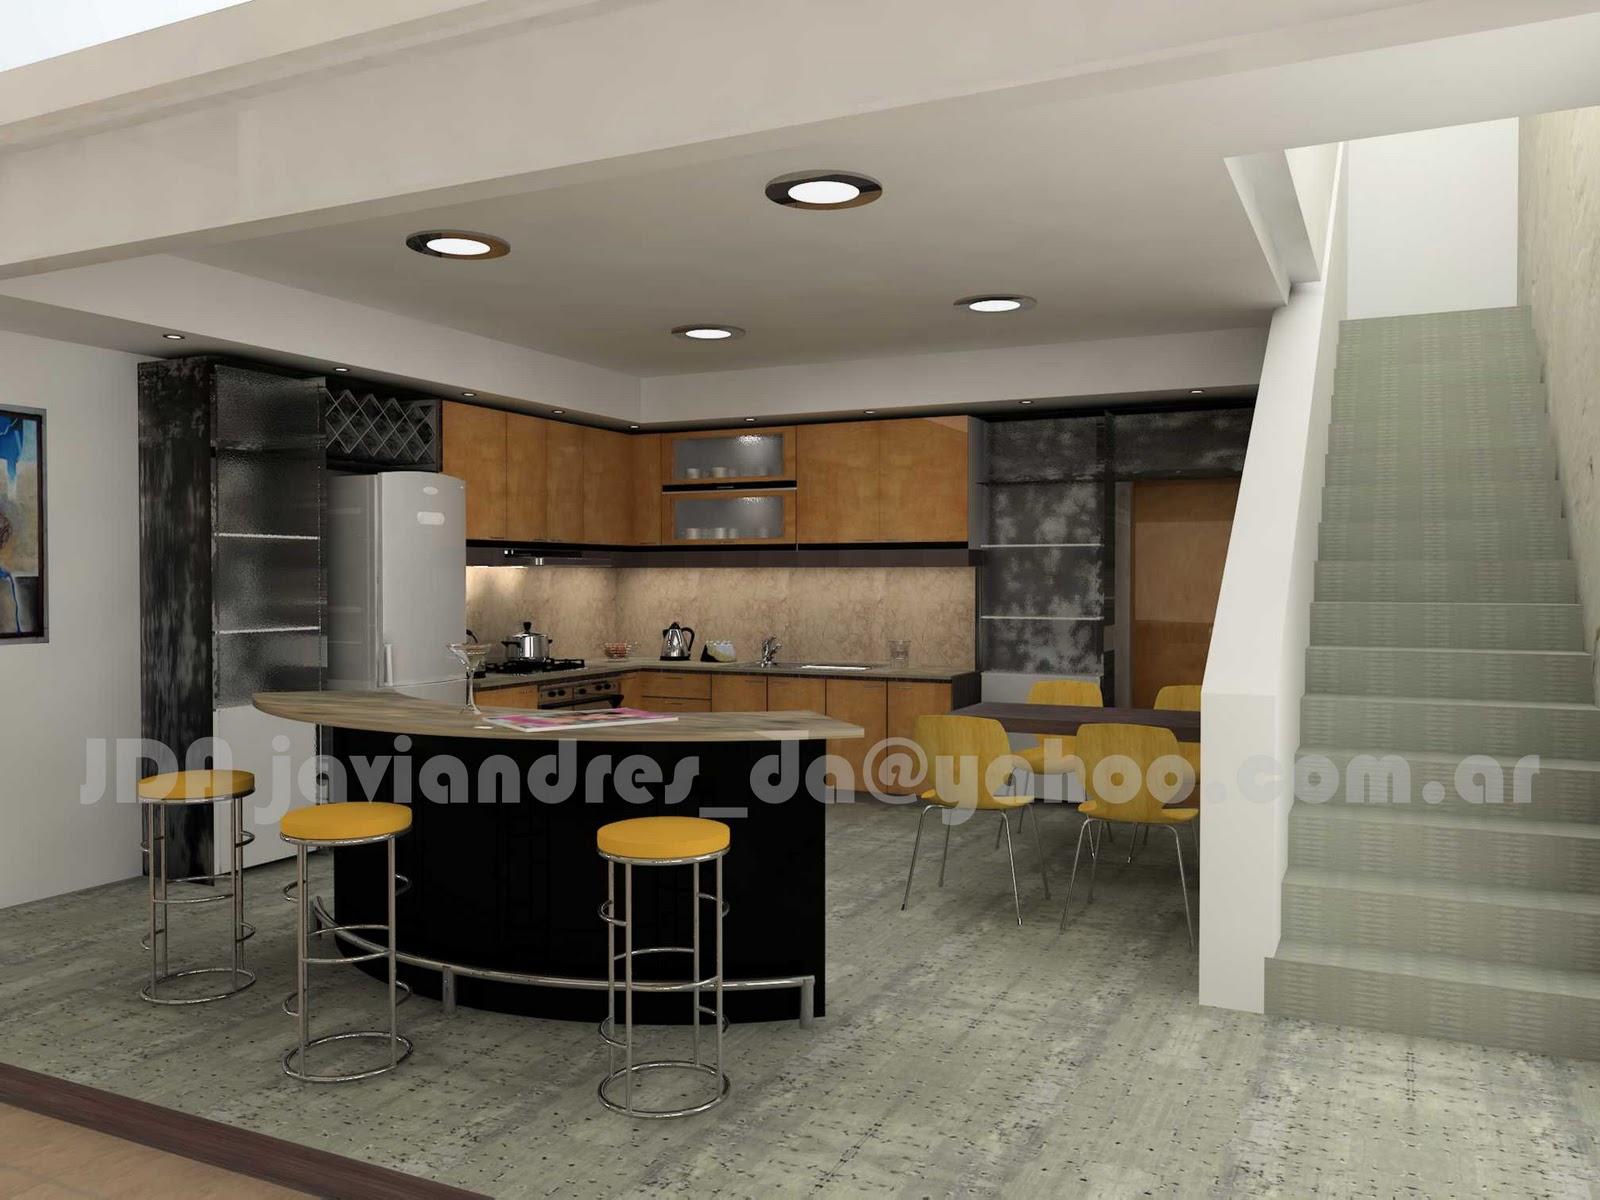 arquitec-maquetas: Cocina minimalista 3d